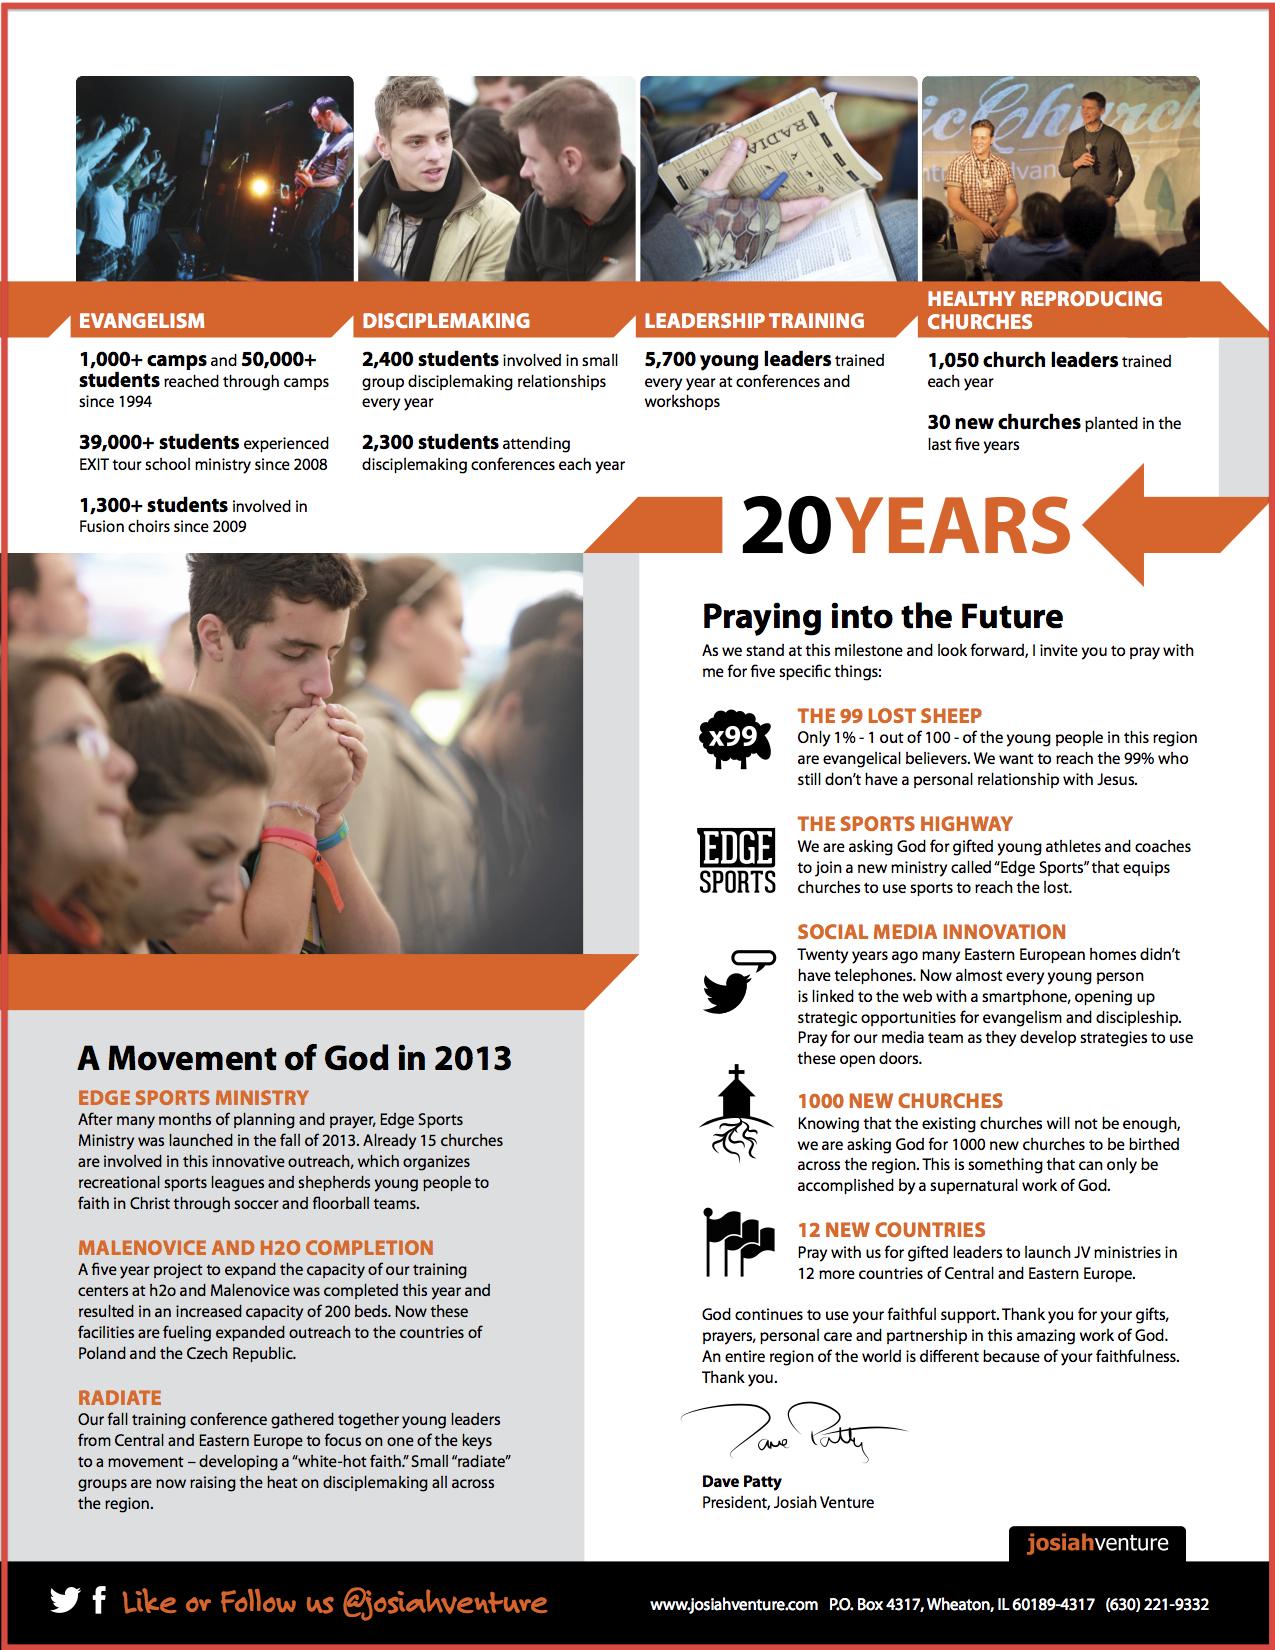 Josiah Venture 2013 Annual Report PAge 2